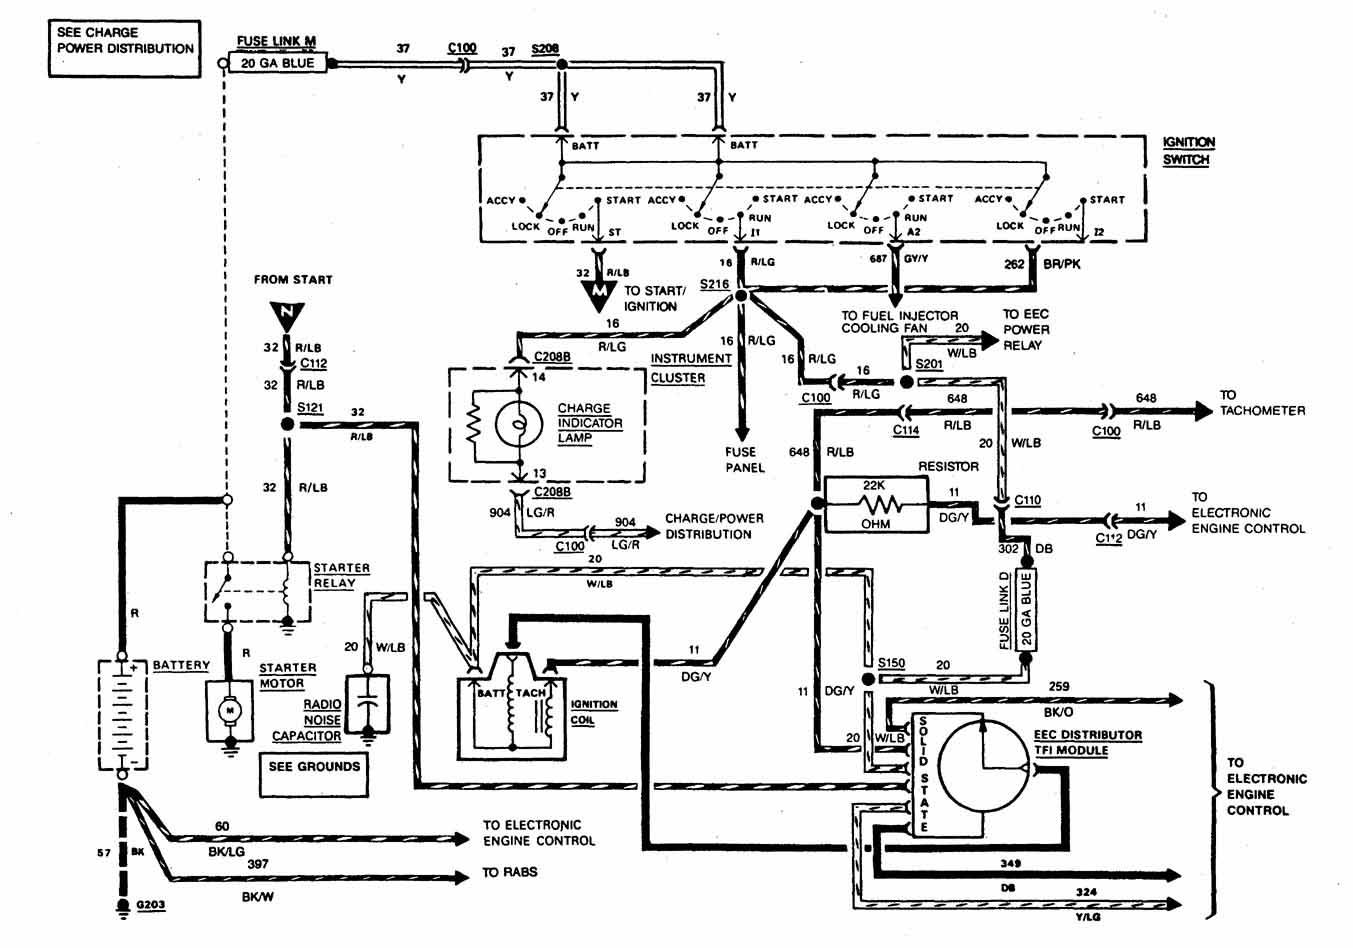 1980 Ford F 150 Ignition Wiring Diagram - Wiring Diagram Data week-service  - week-service.caffenerobollente.it | 1980 Ford F100 Wiring Diagram |  | Caffè nero bollente Caffè nero bollente